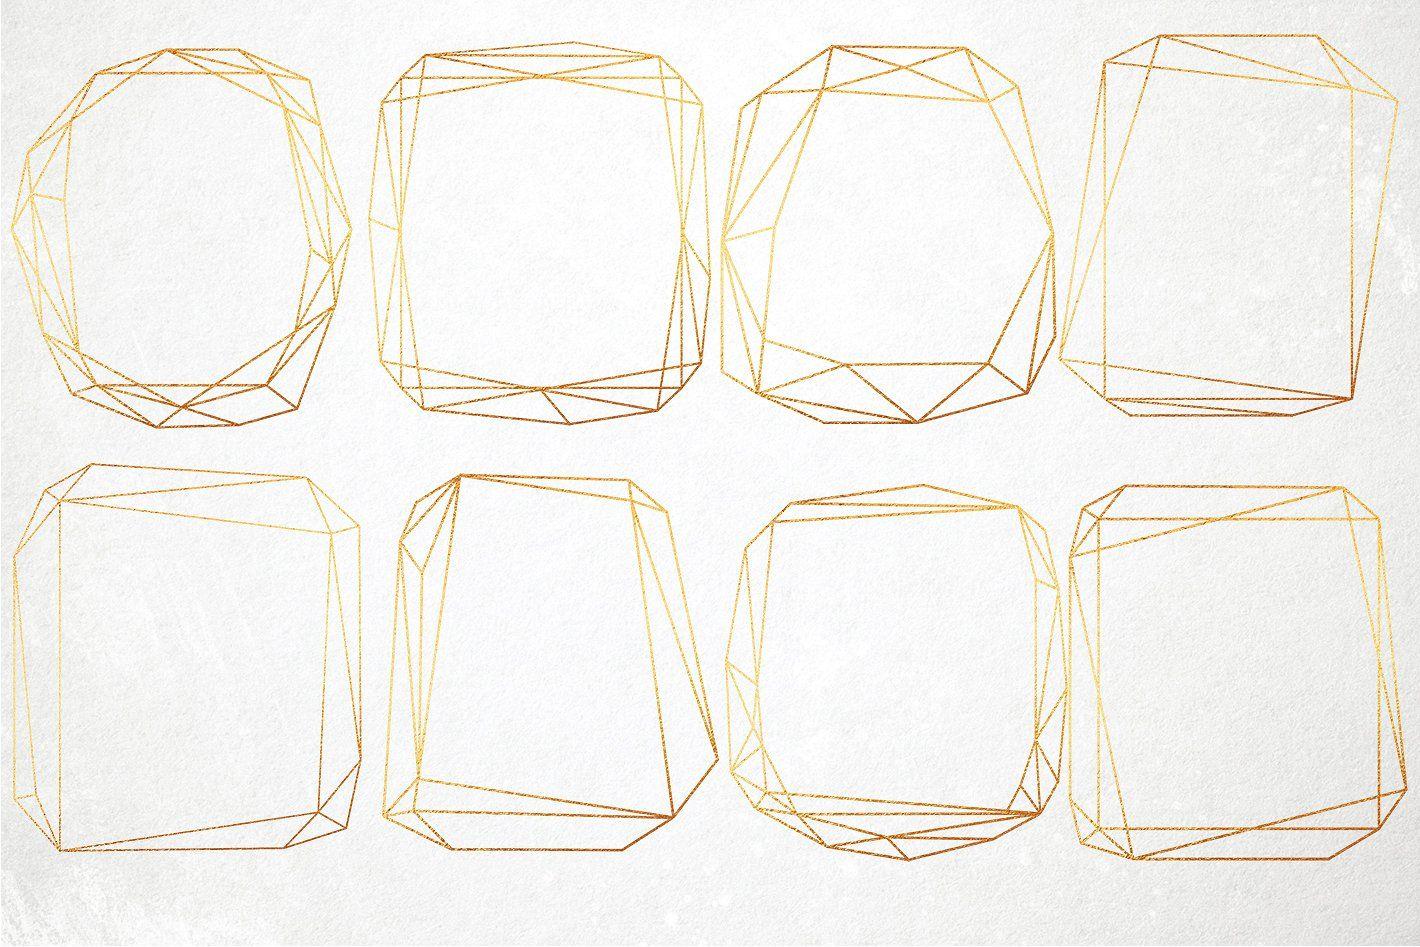 Gold geometric frames clip art #splashes#watercolor#elements.